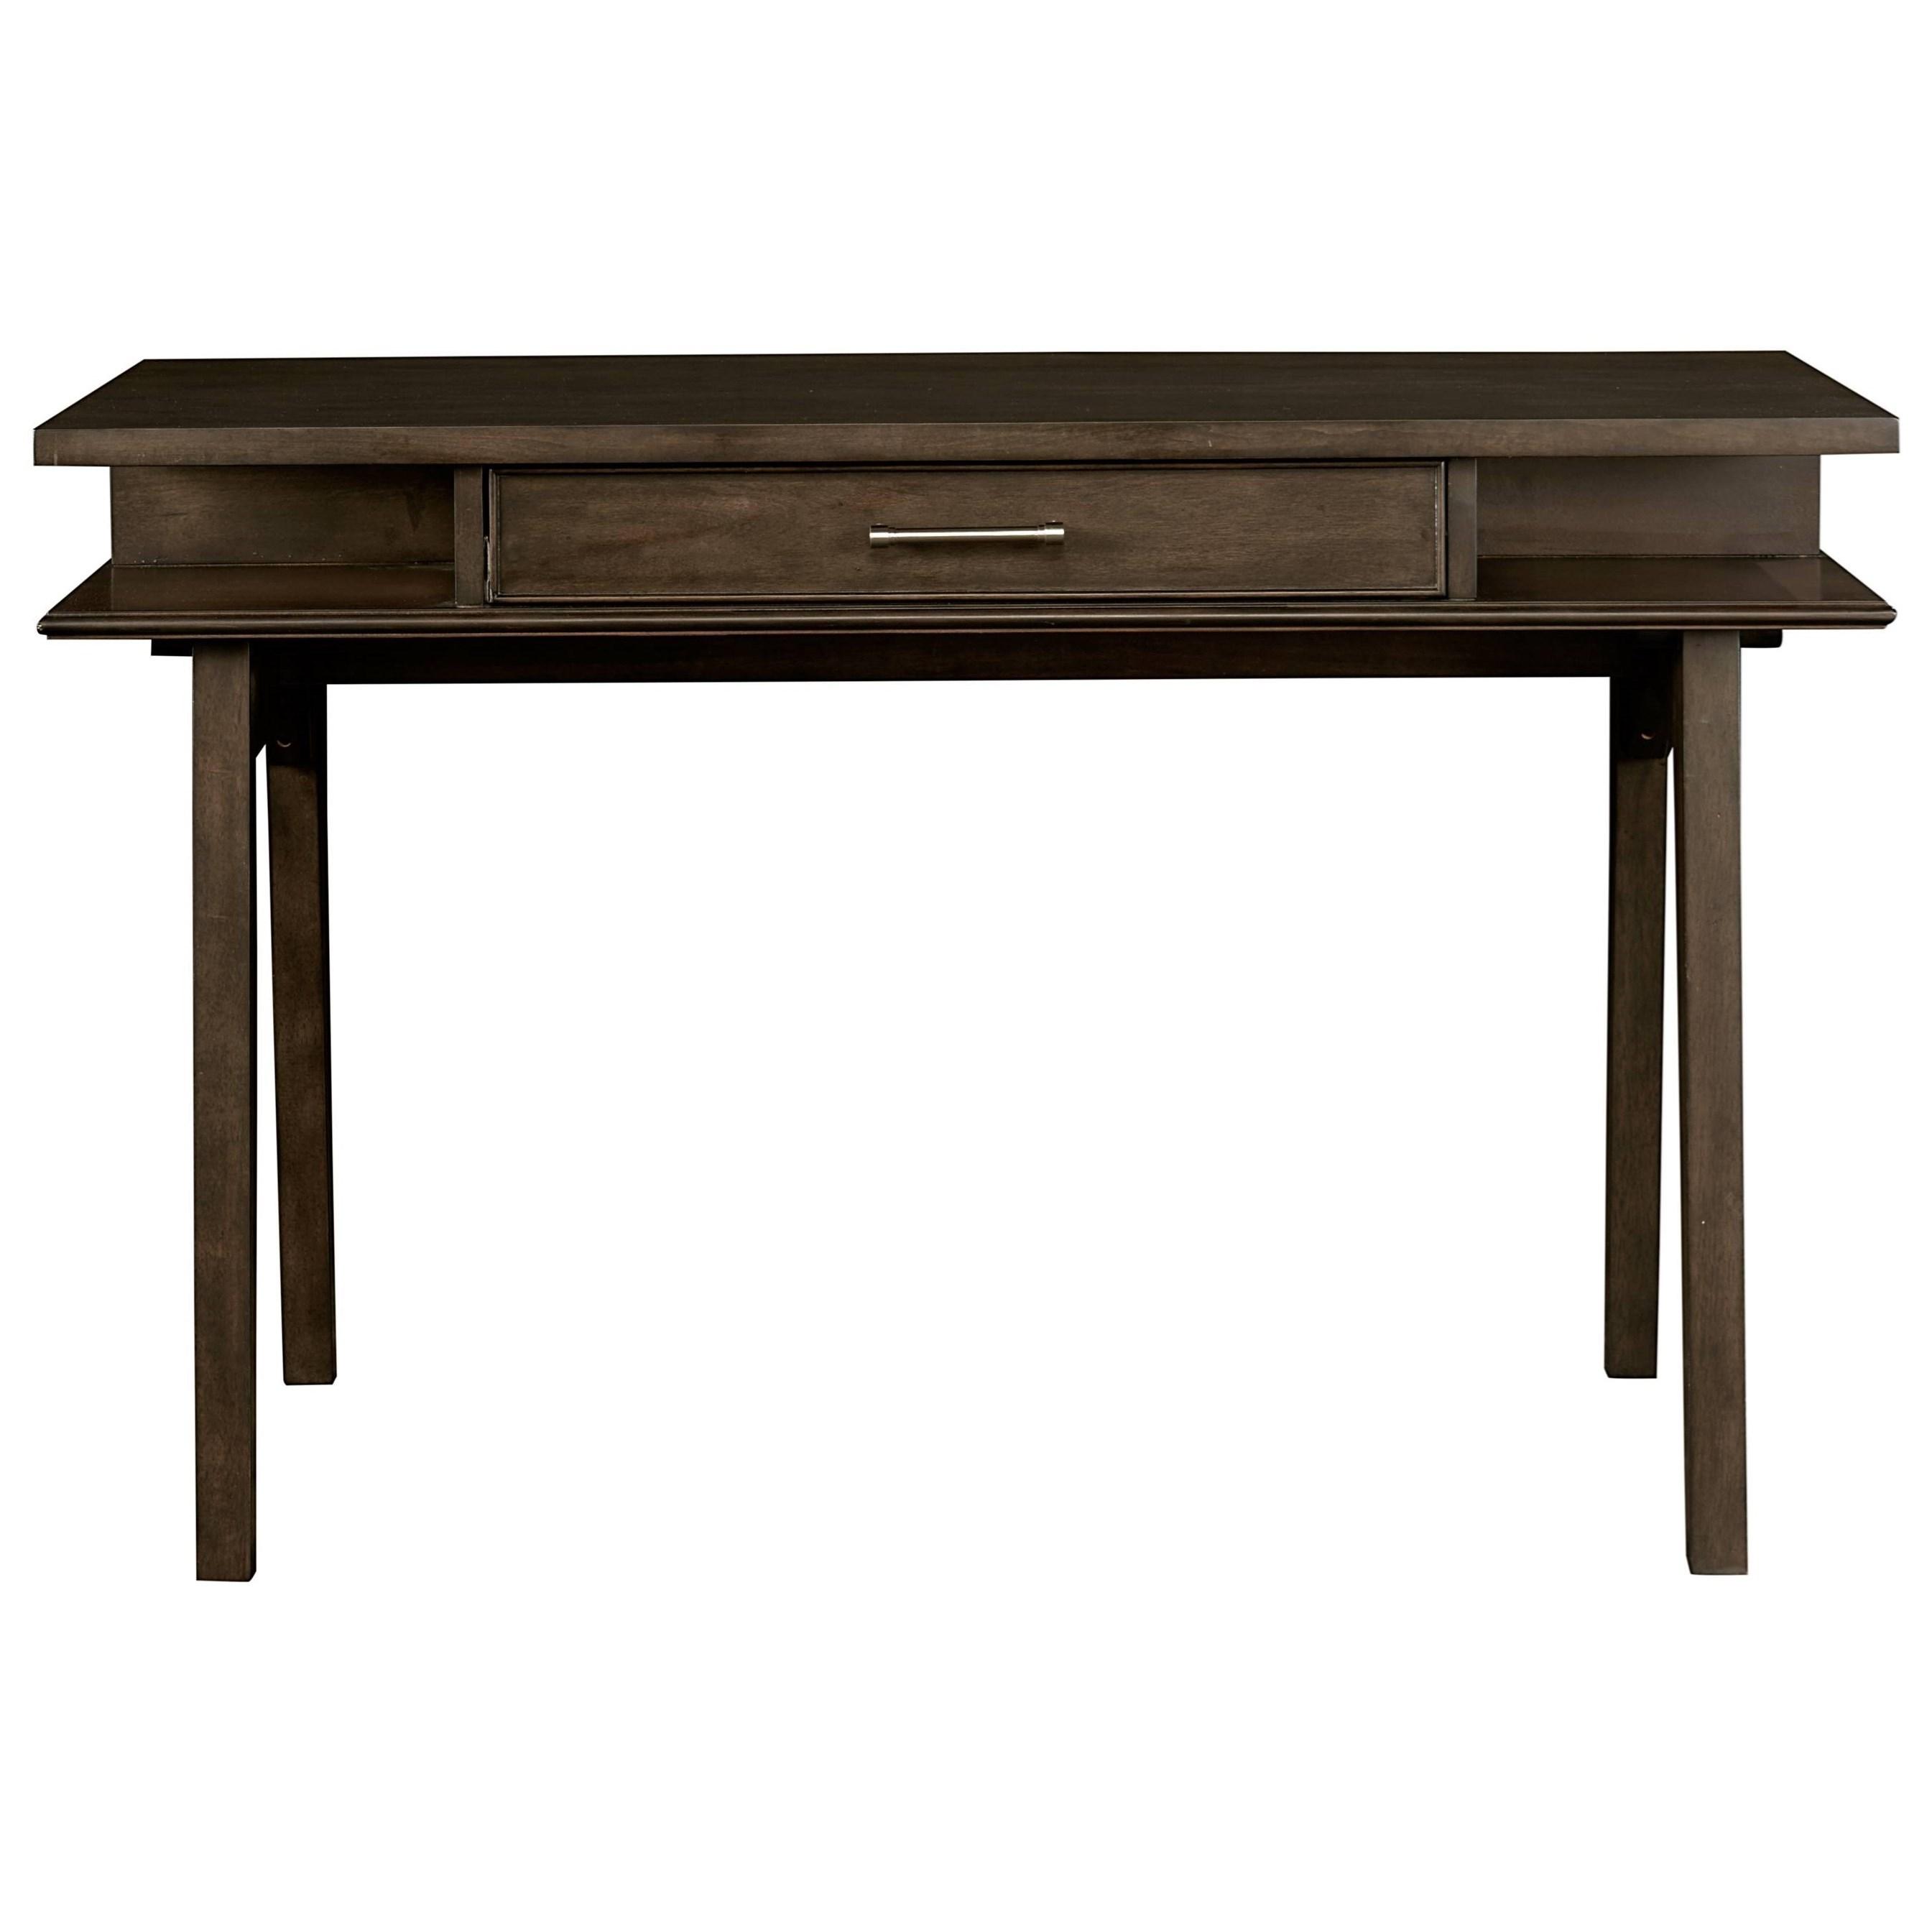 Stone & Leigh Furniture Chelsea Square Desk - Item Number: 584-13-27